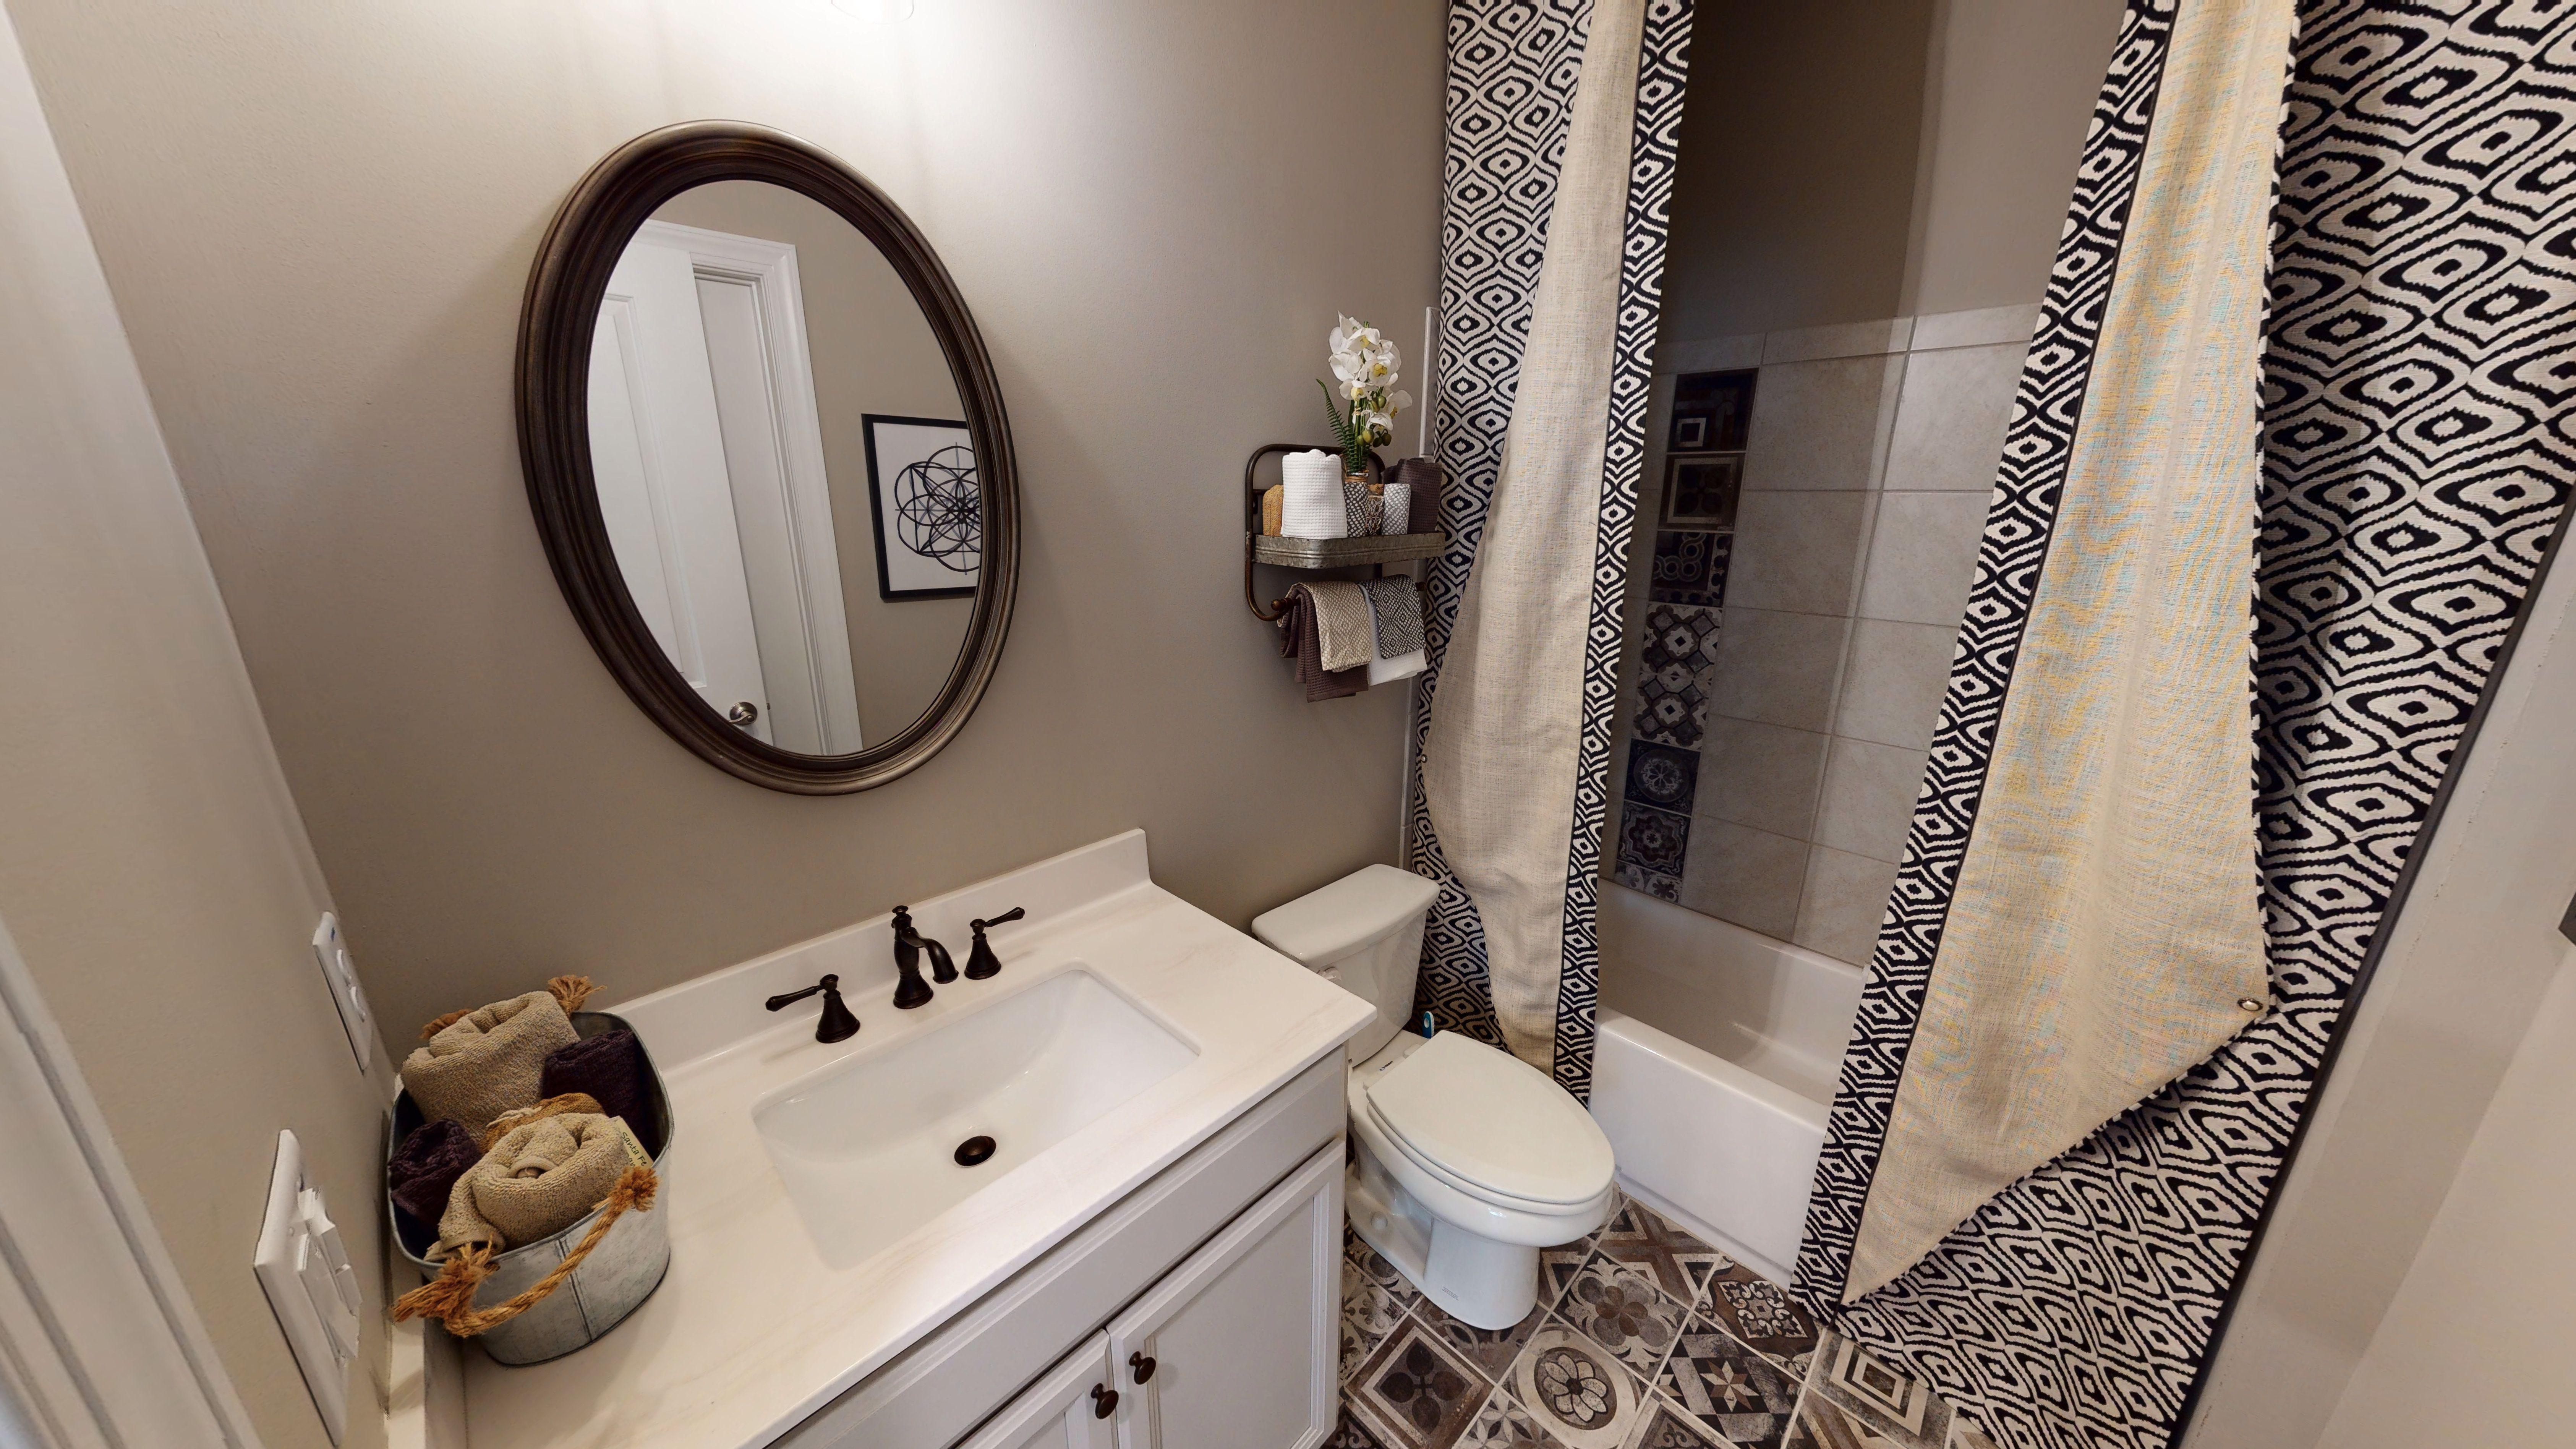 Bathroom featured in The Westport By O'Dwyer Homes in Atlanta, GA